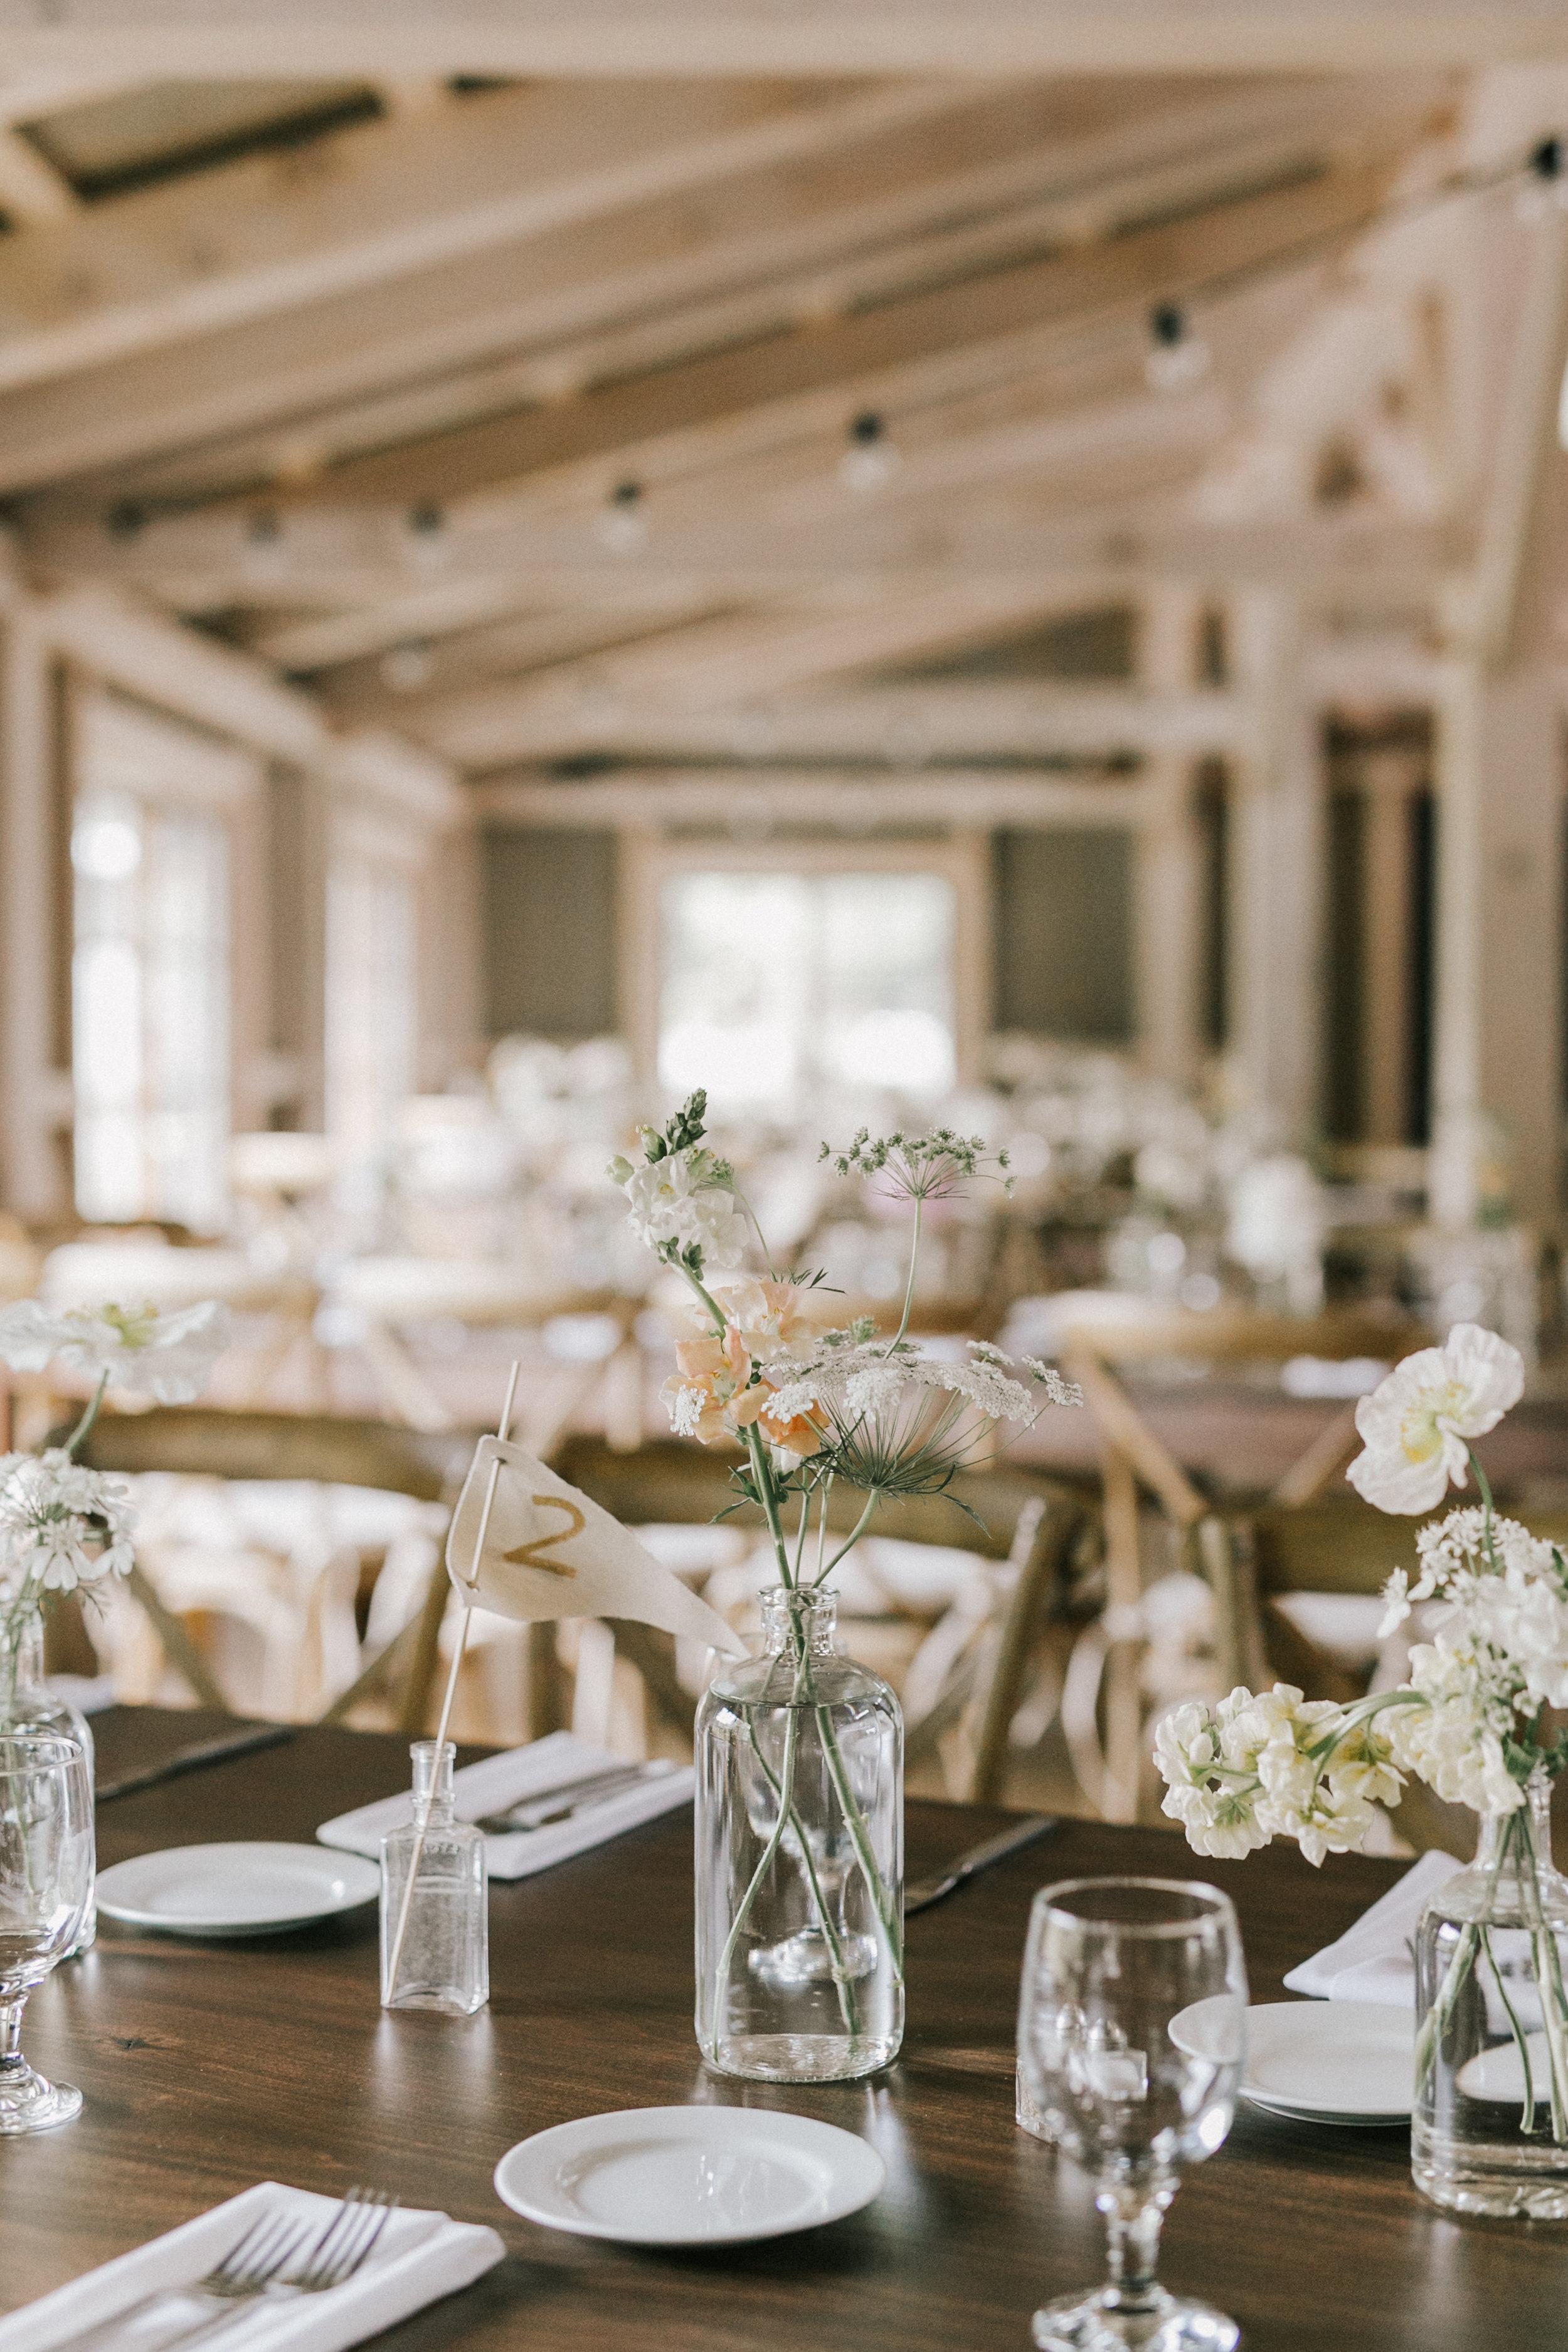 Watershed_Floral_Marianmade_Farm_Wedding_JamieMercurioPhoto2018-169.jpg